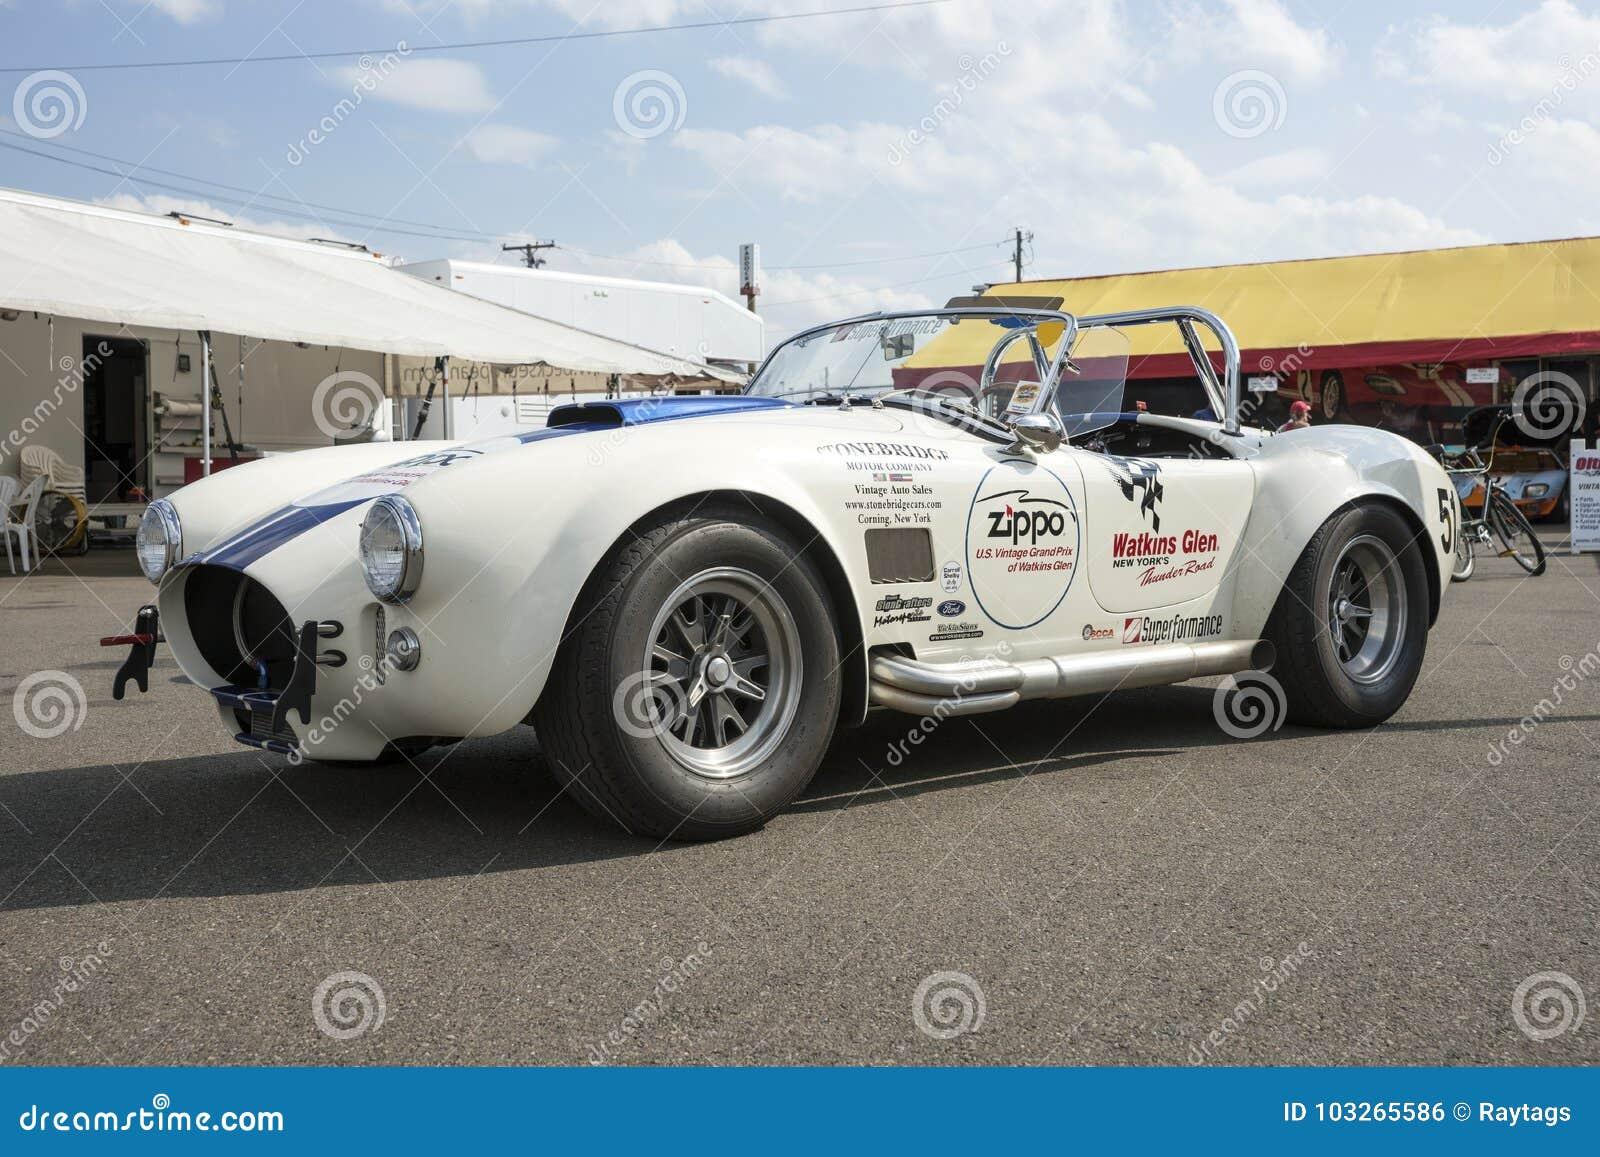 Vintage Ac Cobra In Display Editorial Photo - Image of sport, retro ...